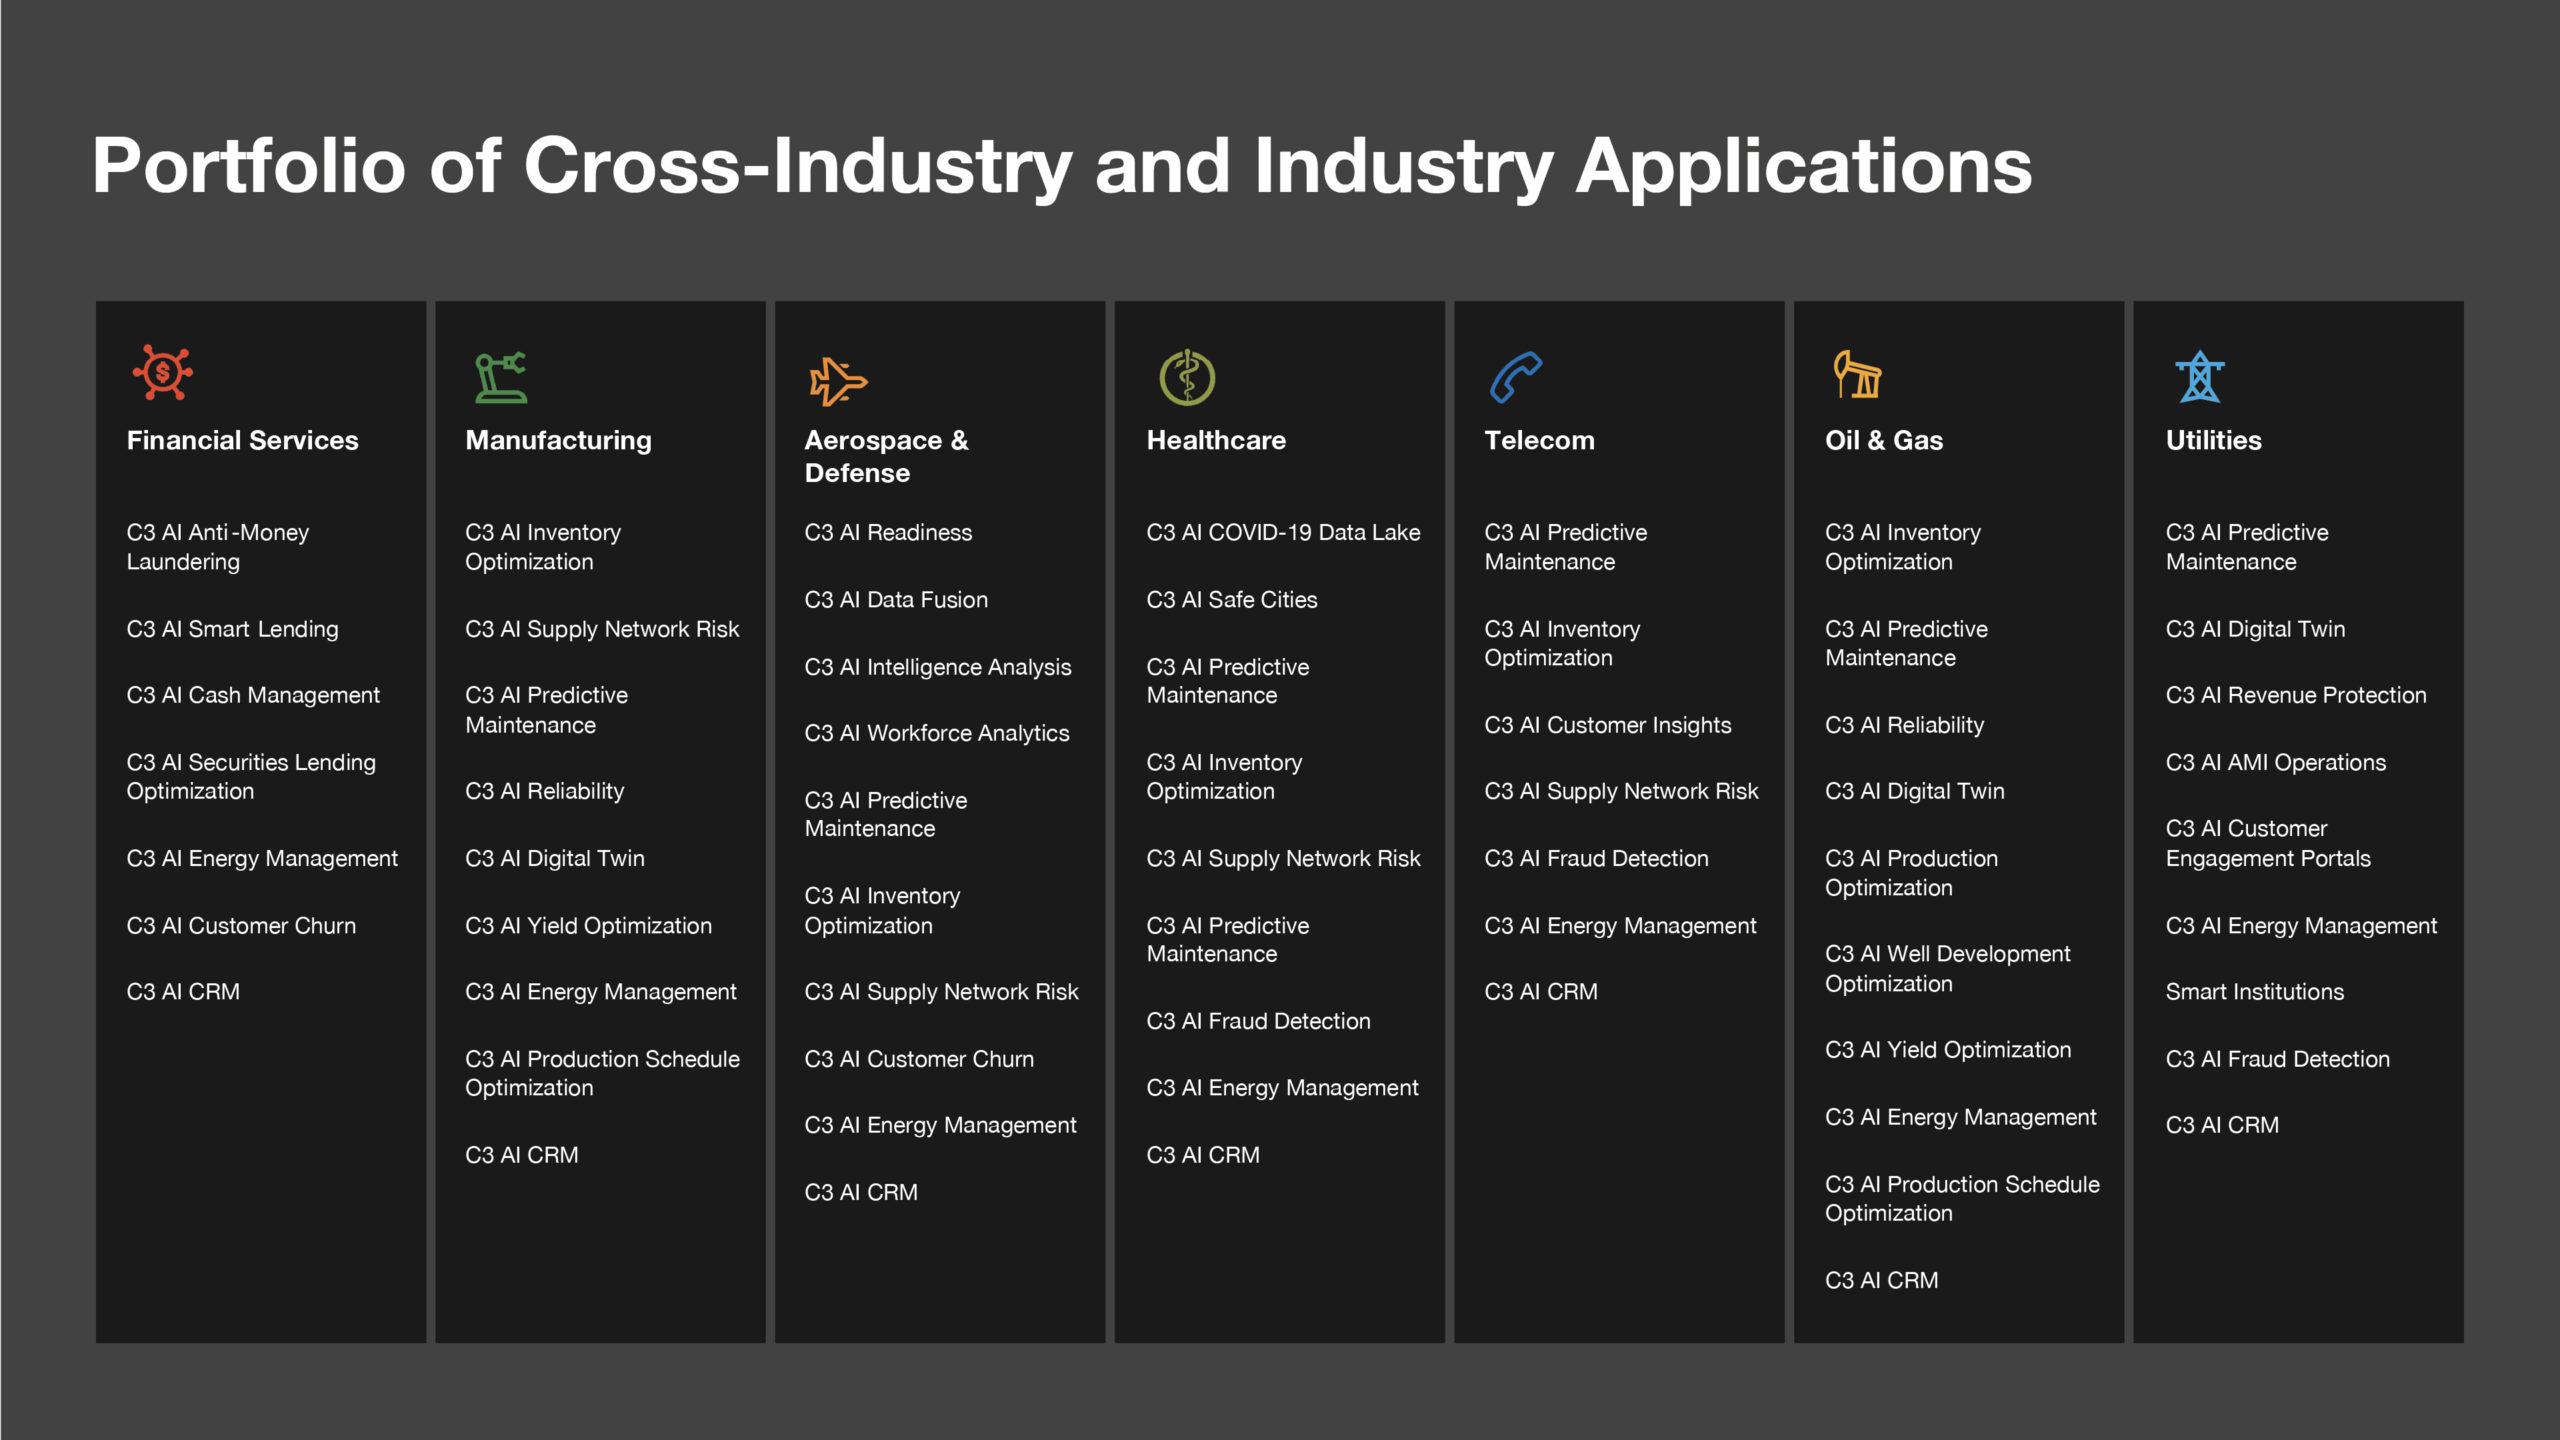 C3 AI Applications